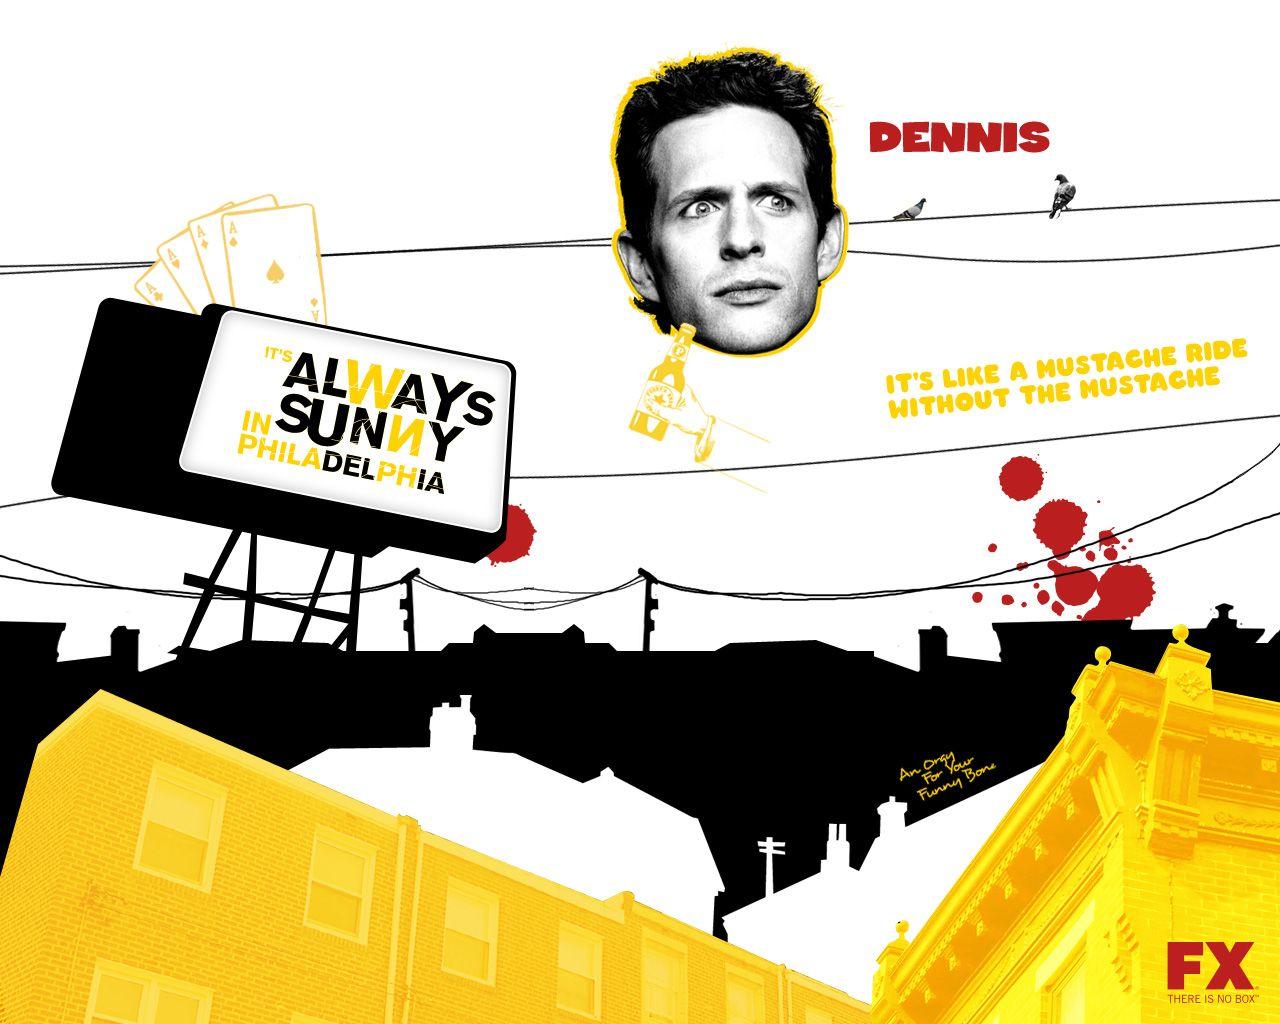 Dennis wallpaper, Its Always Sunny in Philadelphia | Regulars at ...